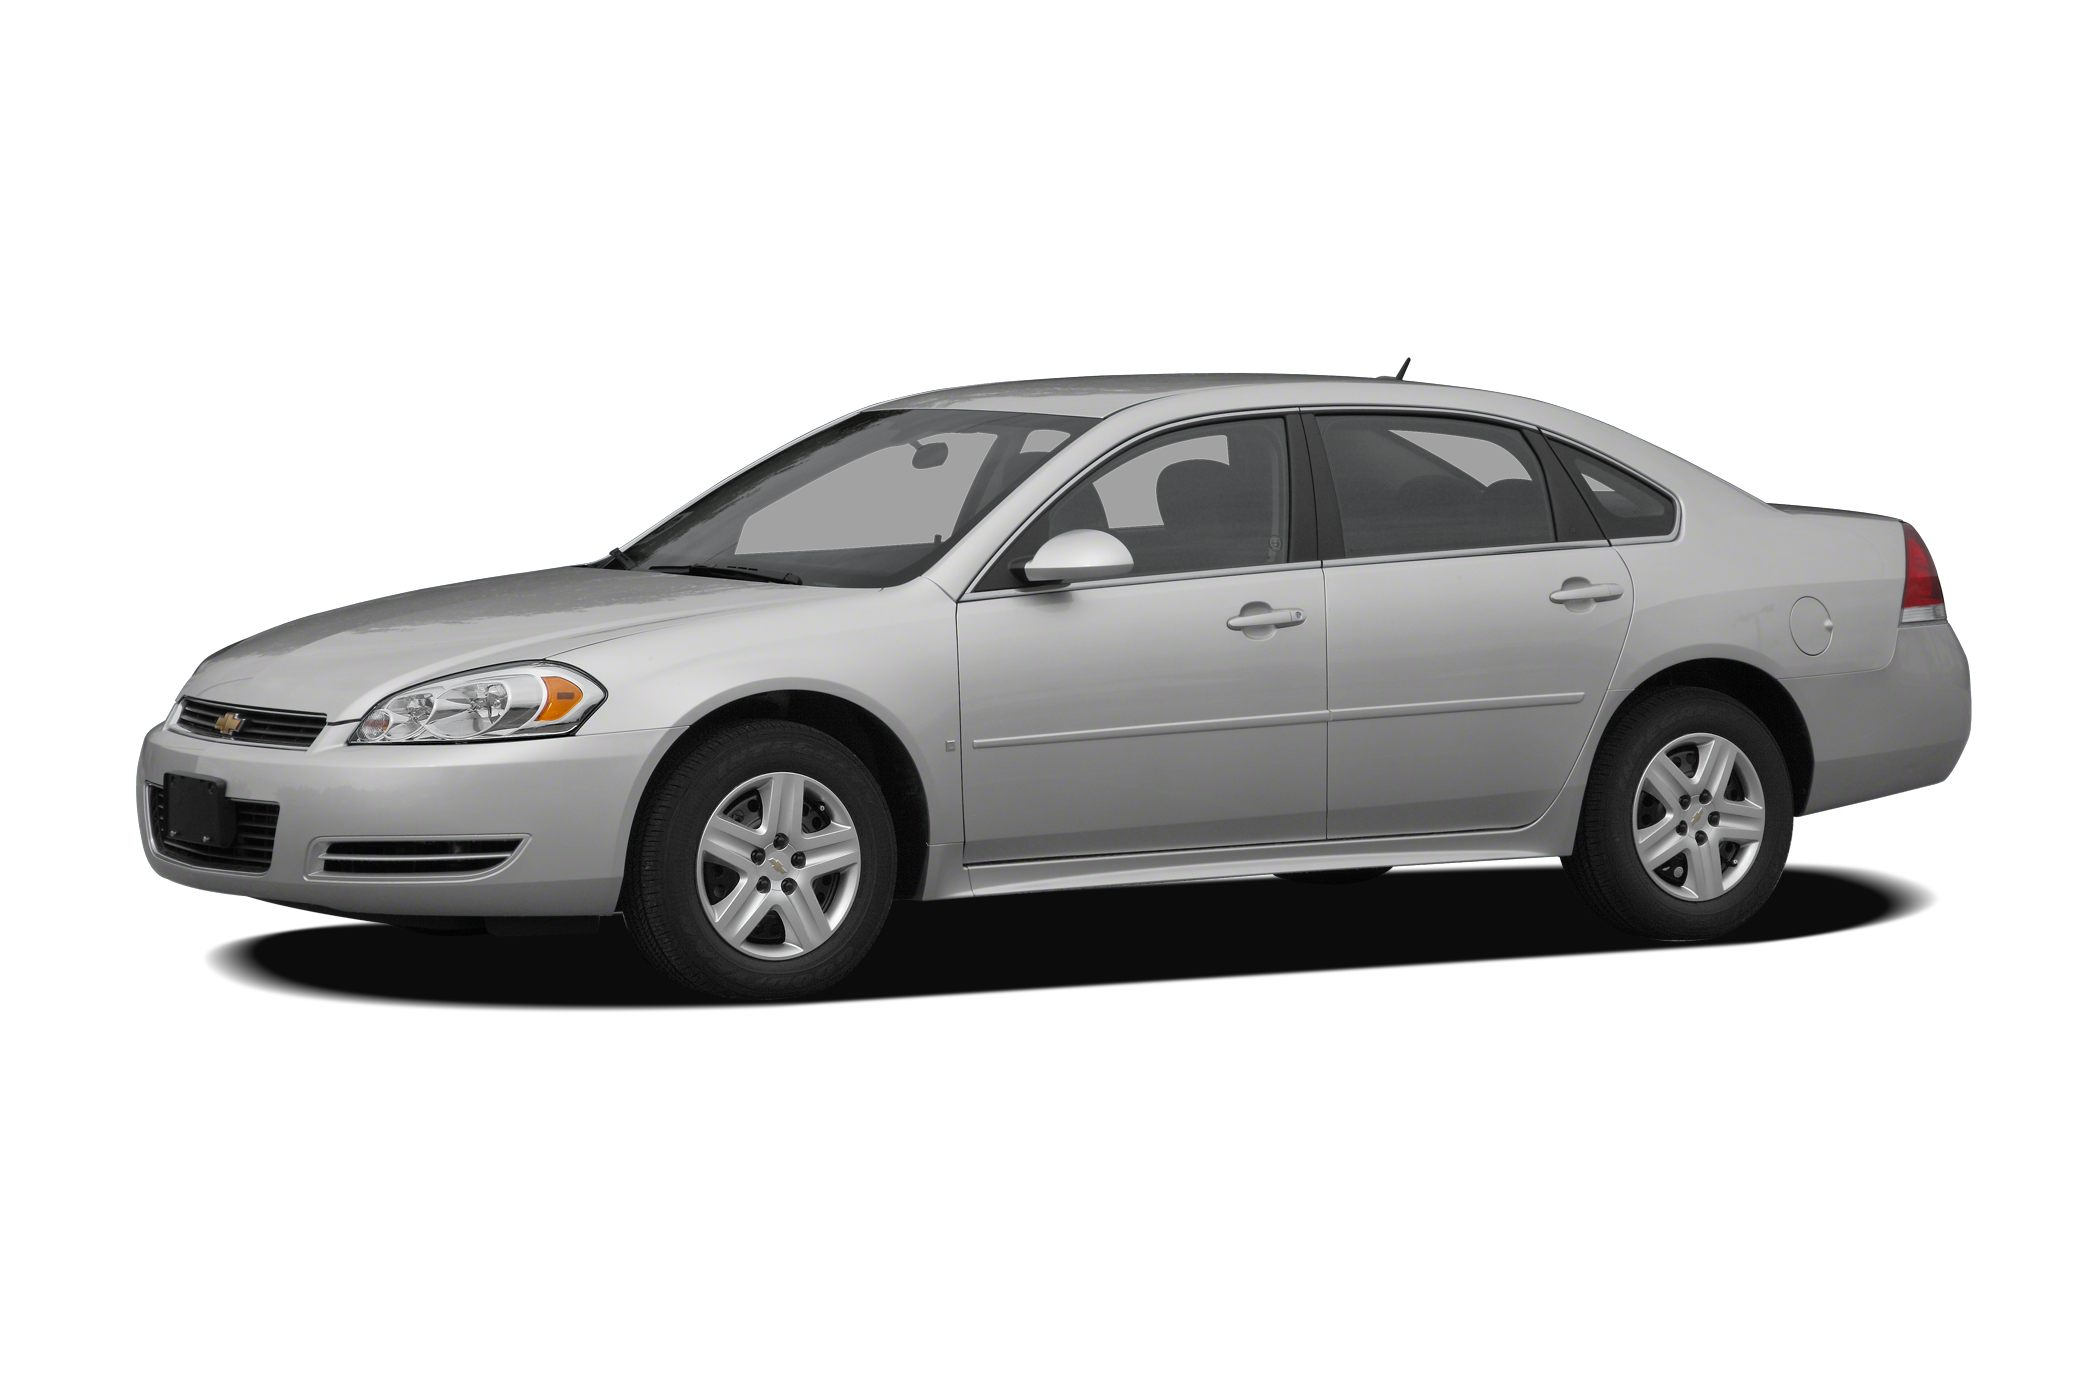 2009 Chevrolet Impala SS Miles 154408Stock TS244639 VIN 2G1WD57C091244639